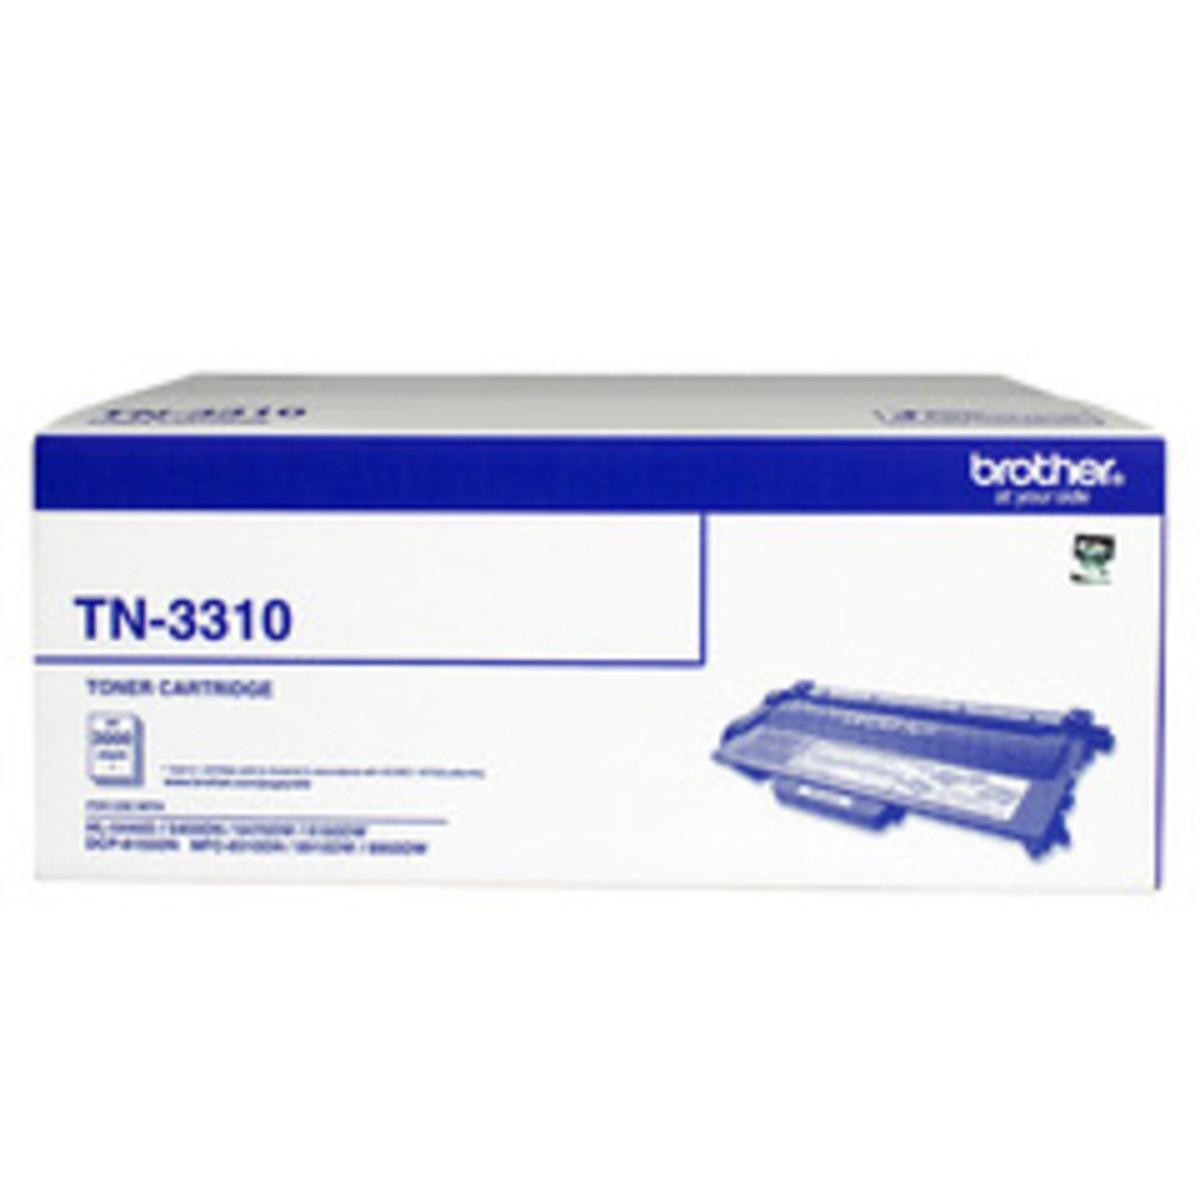 Brother TN-3310 Black Toner Cartridge